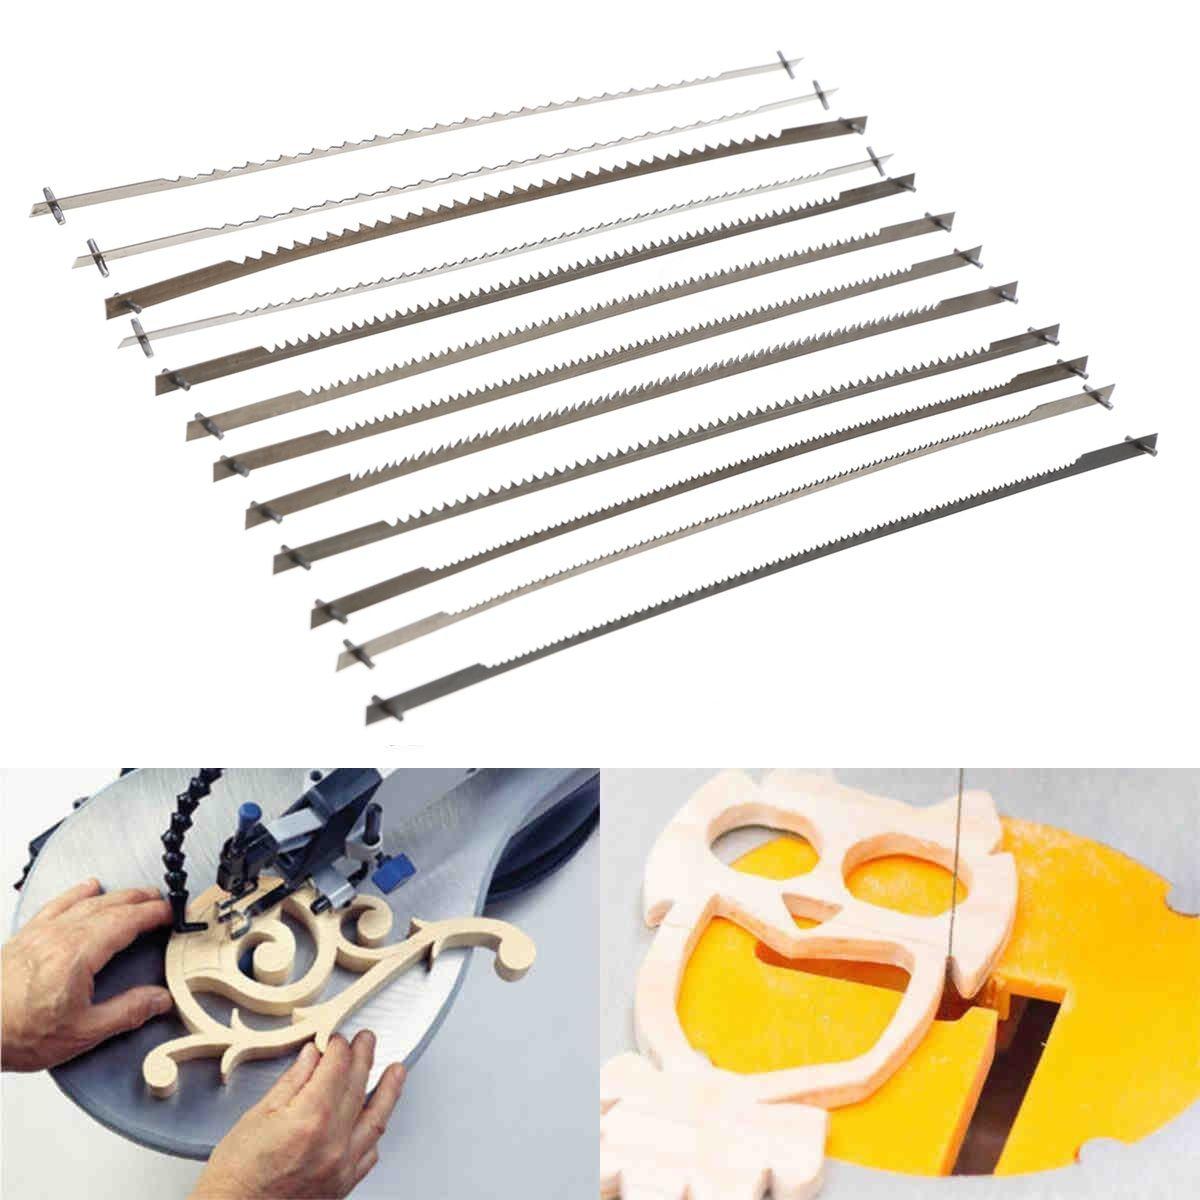 DWZ 12x Pinned Scroll Saw Blades Woodworking Power Tools Accessories 127mm BlackDWZ 12x Pinned Scroll Saw Blades Woodworking Power Tools Accessories 127mm Black